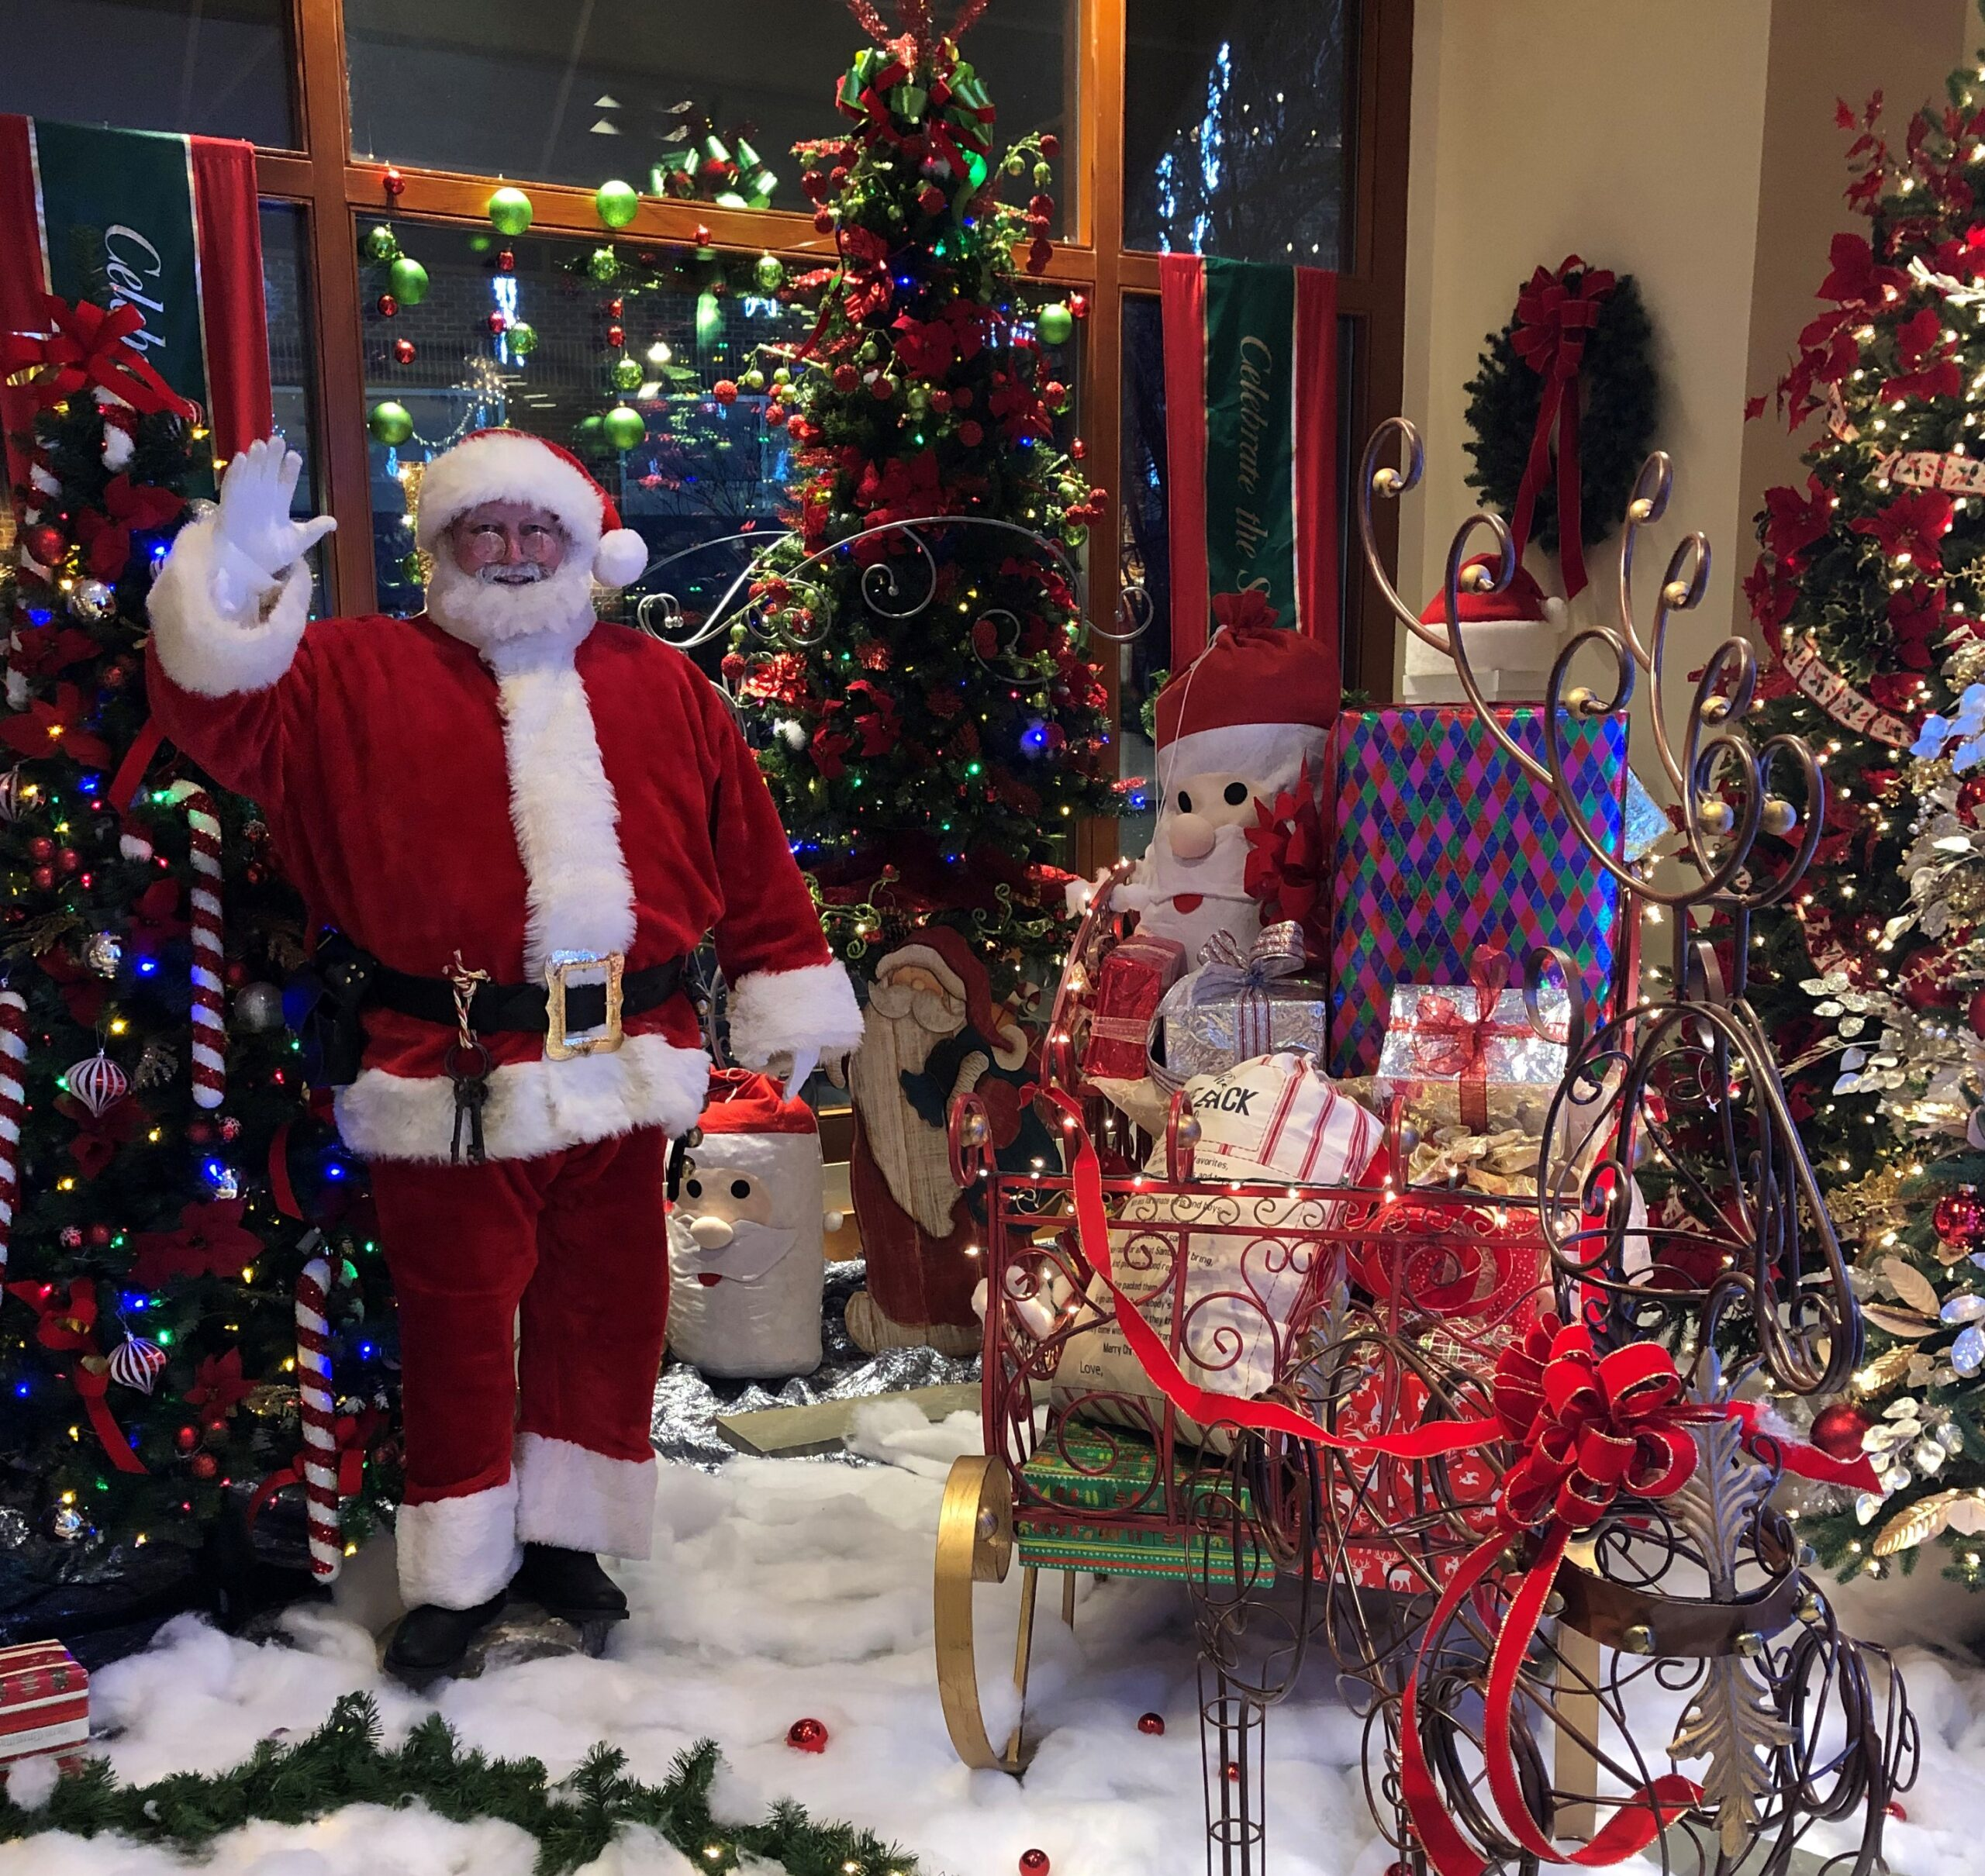 Santa Earl and sleigh